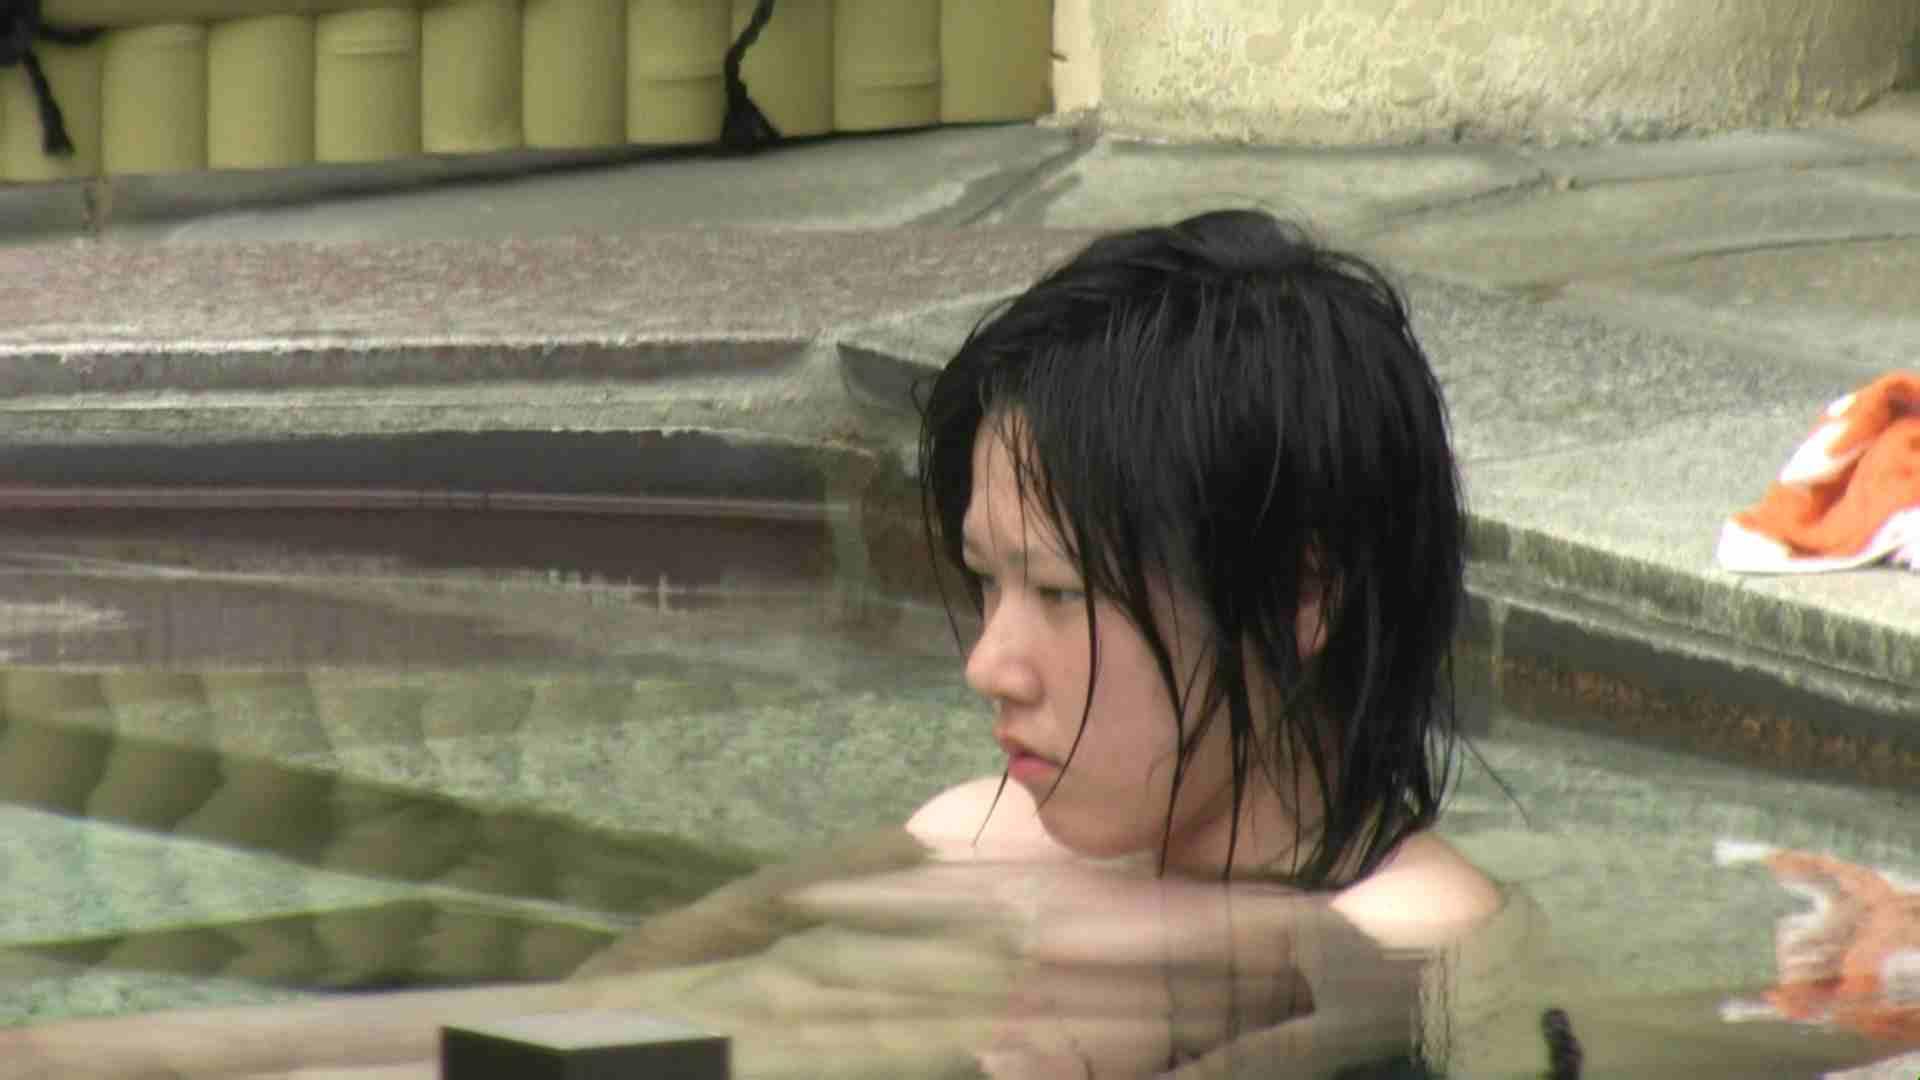 Aquaな露天風呂Vol.36 盗撮シリーズ   露天風呂編  99PIX 55